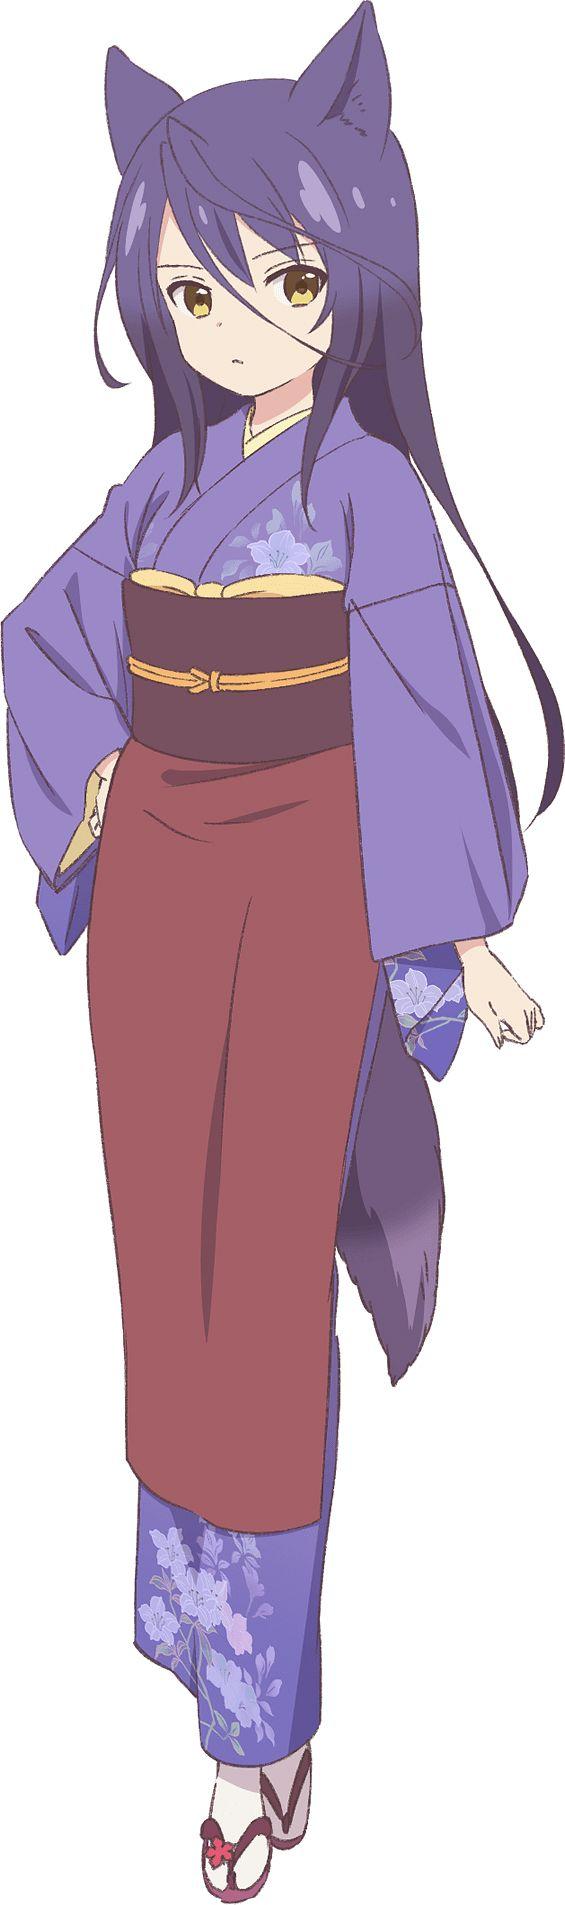 Satsuki (Konohana Kitan) - Konohana Kitan